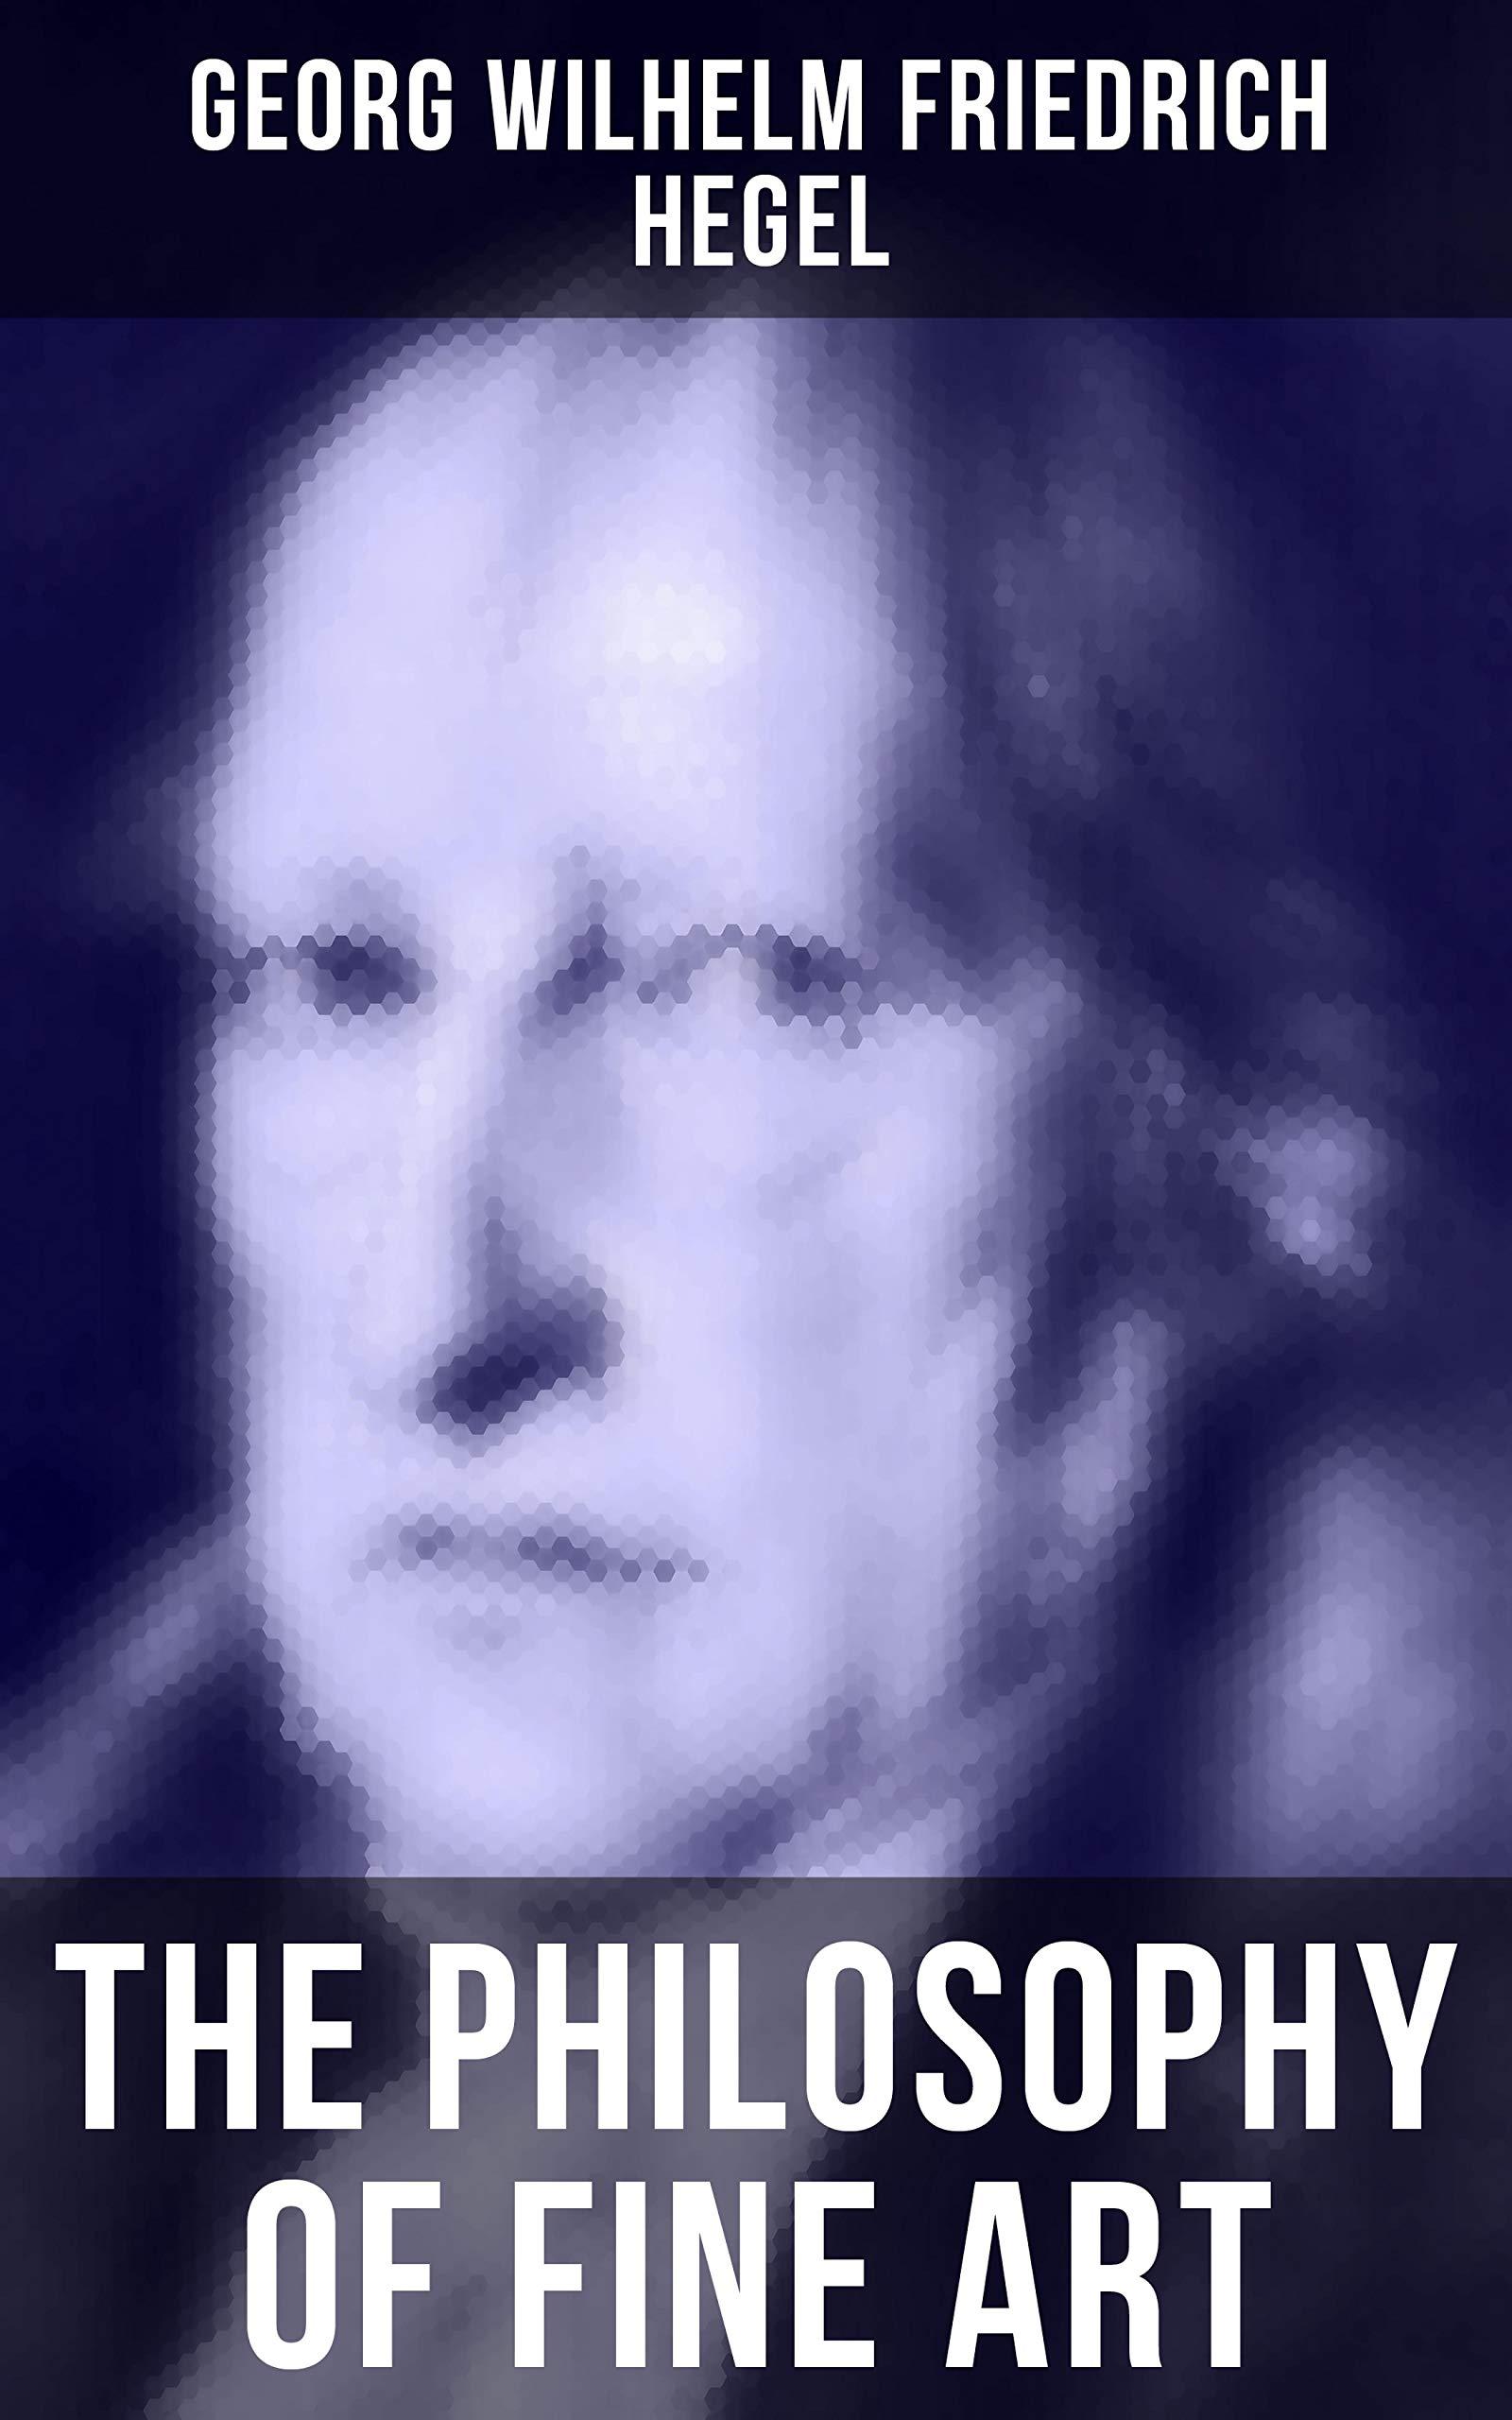 The Philosophy of Fine Art